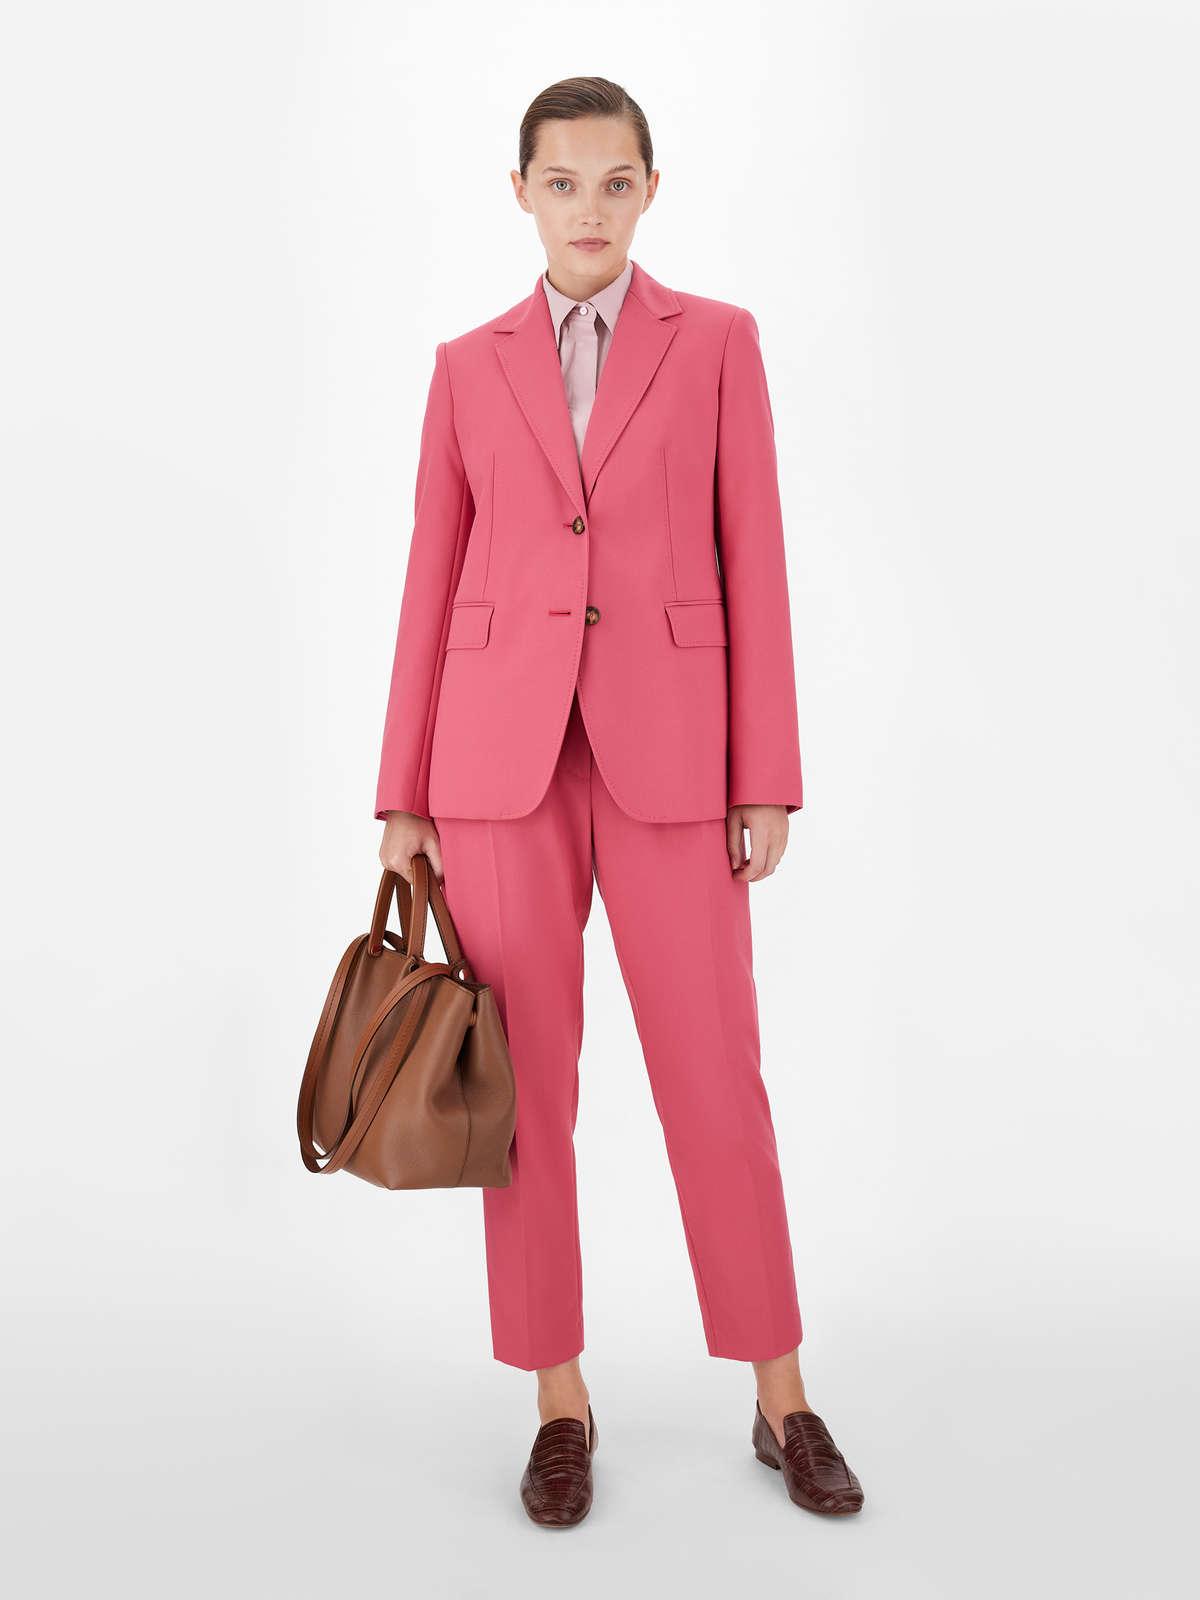 Cotton crepe trousers - Max Mara